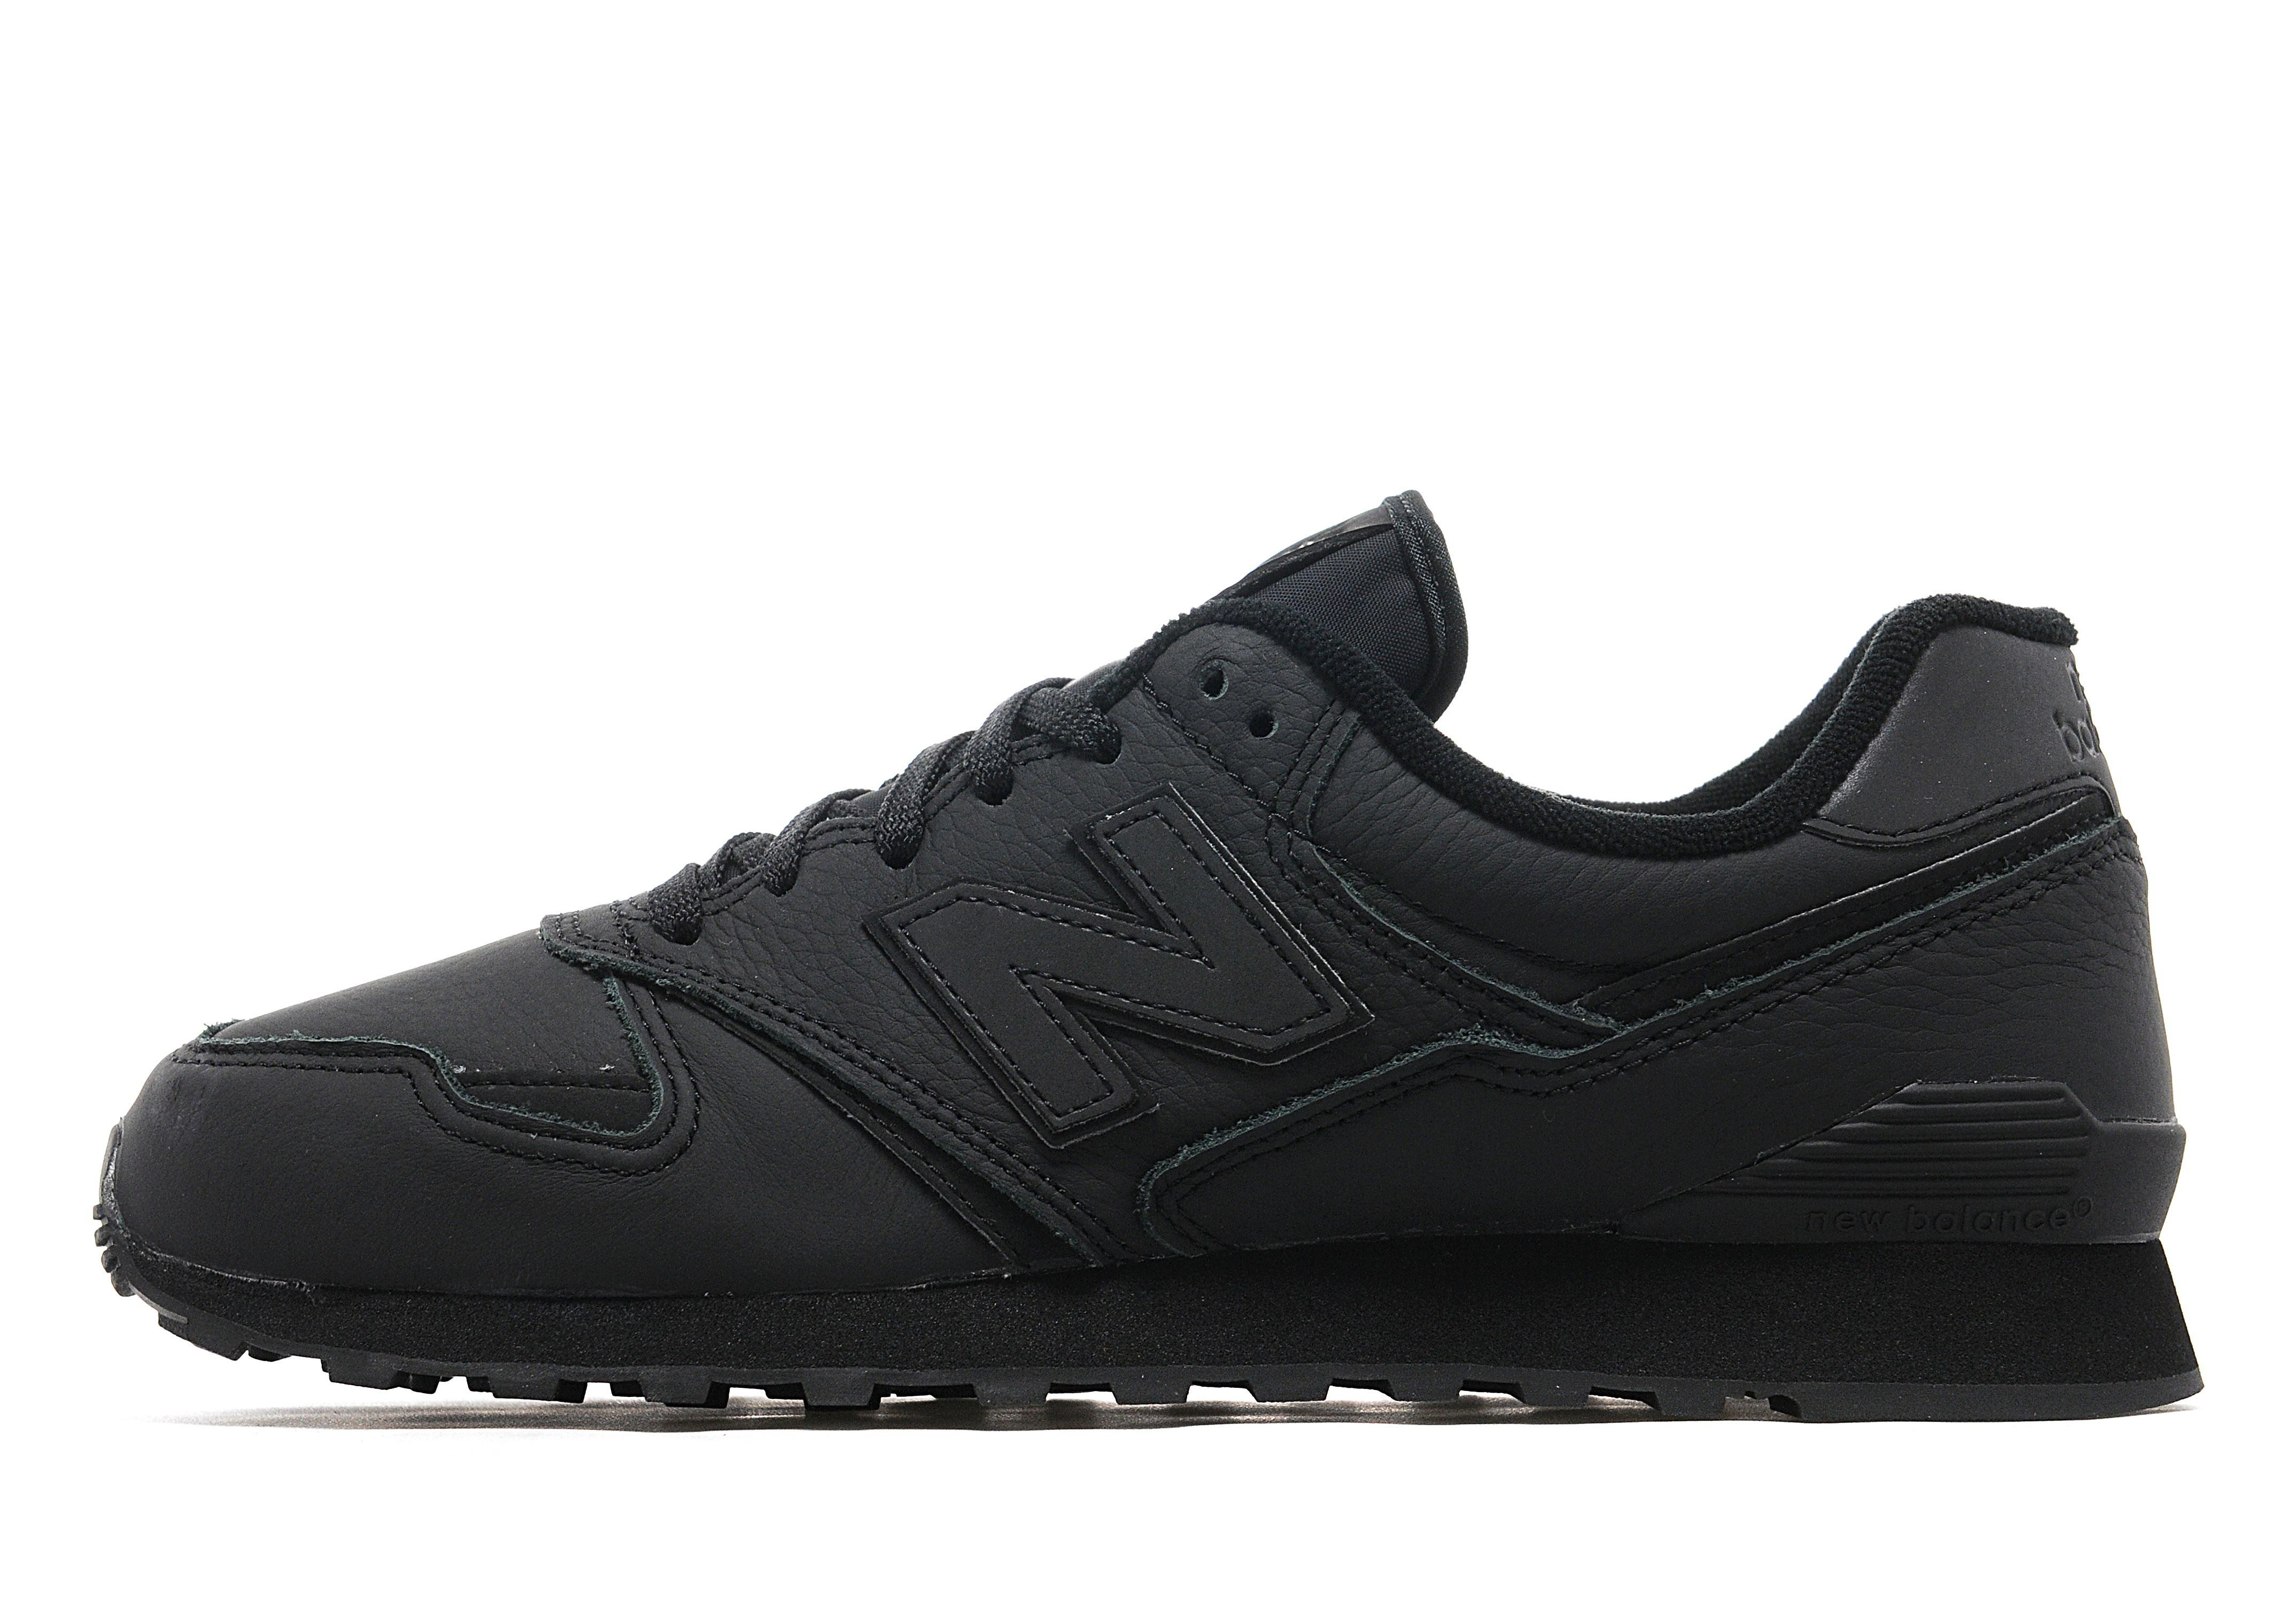 New Balance 446 Leather